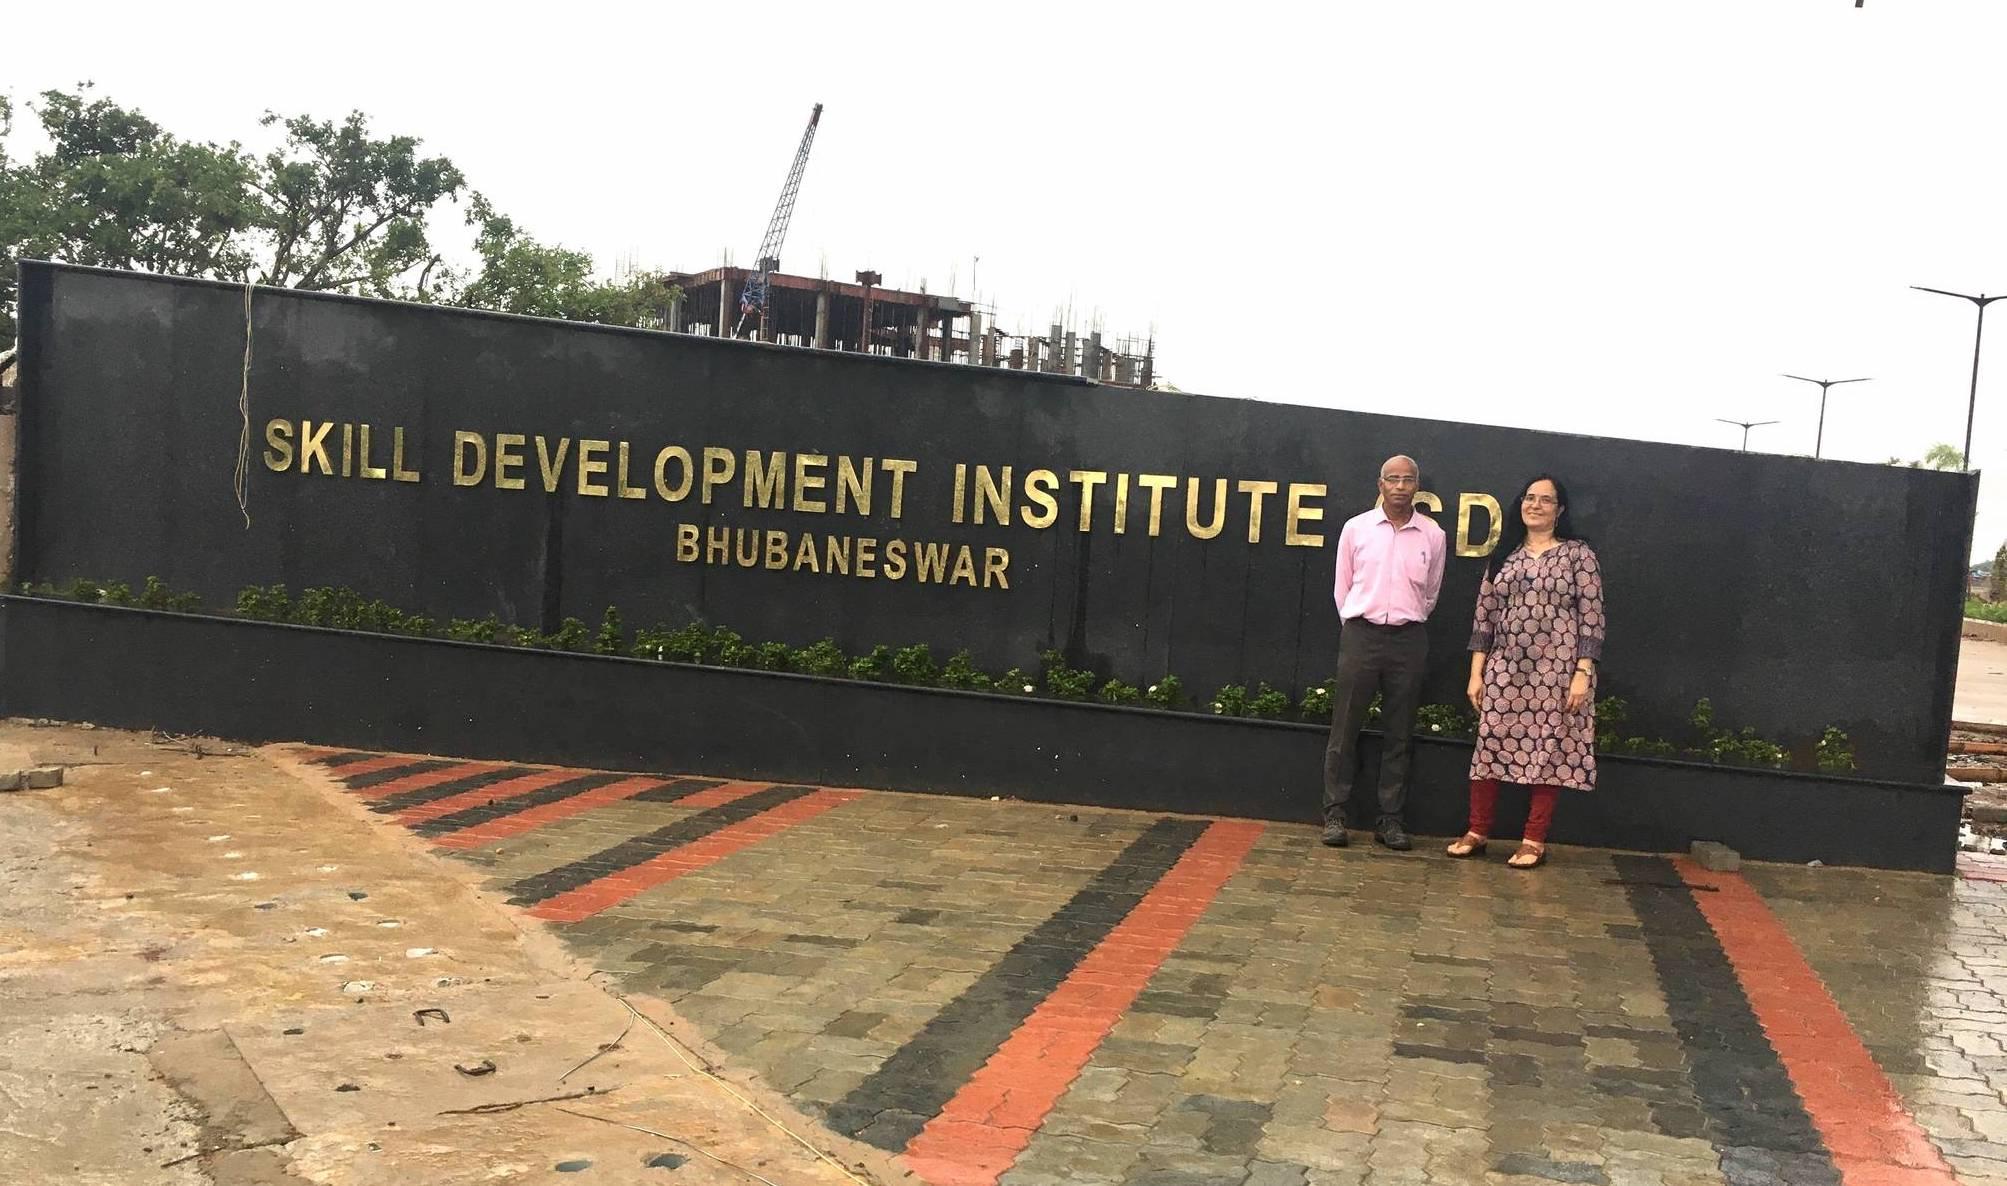 Skill Development Institute (SDI) Bhubaneswar New Campus - A Mega Model Multiskilling Academy